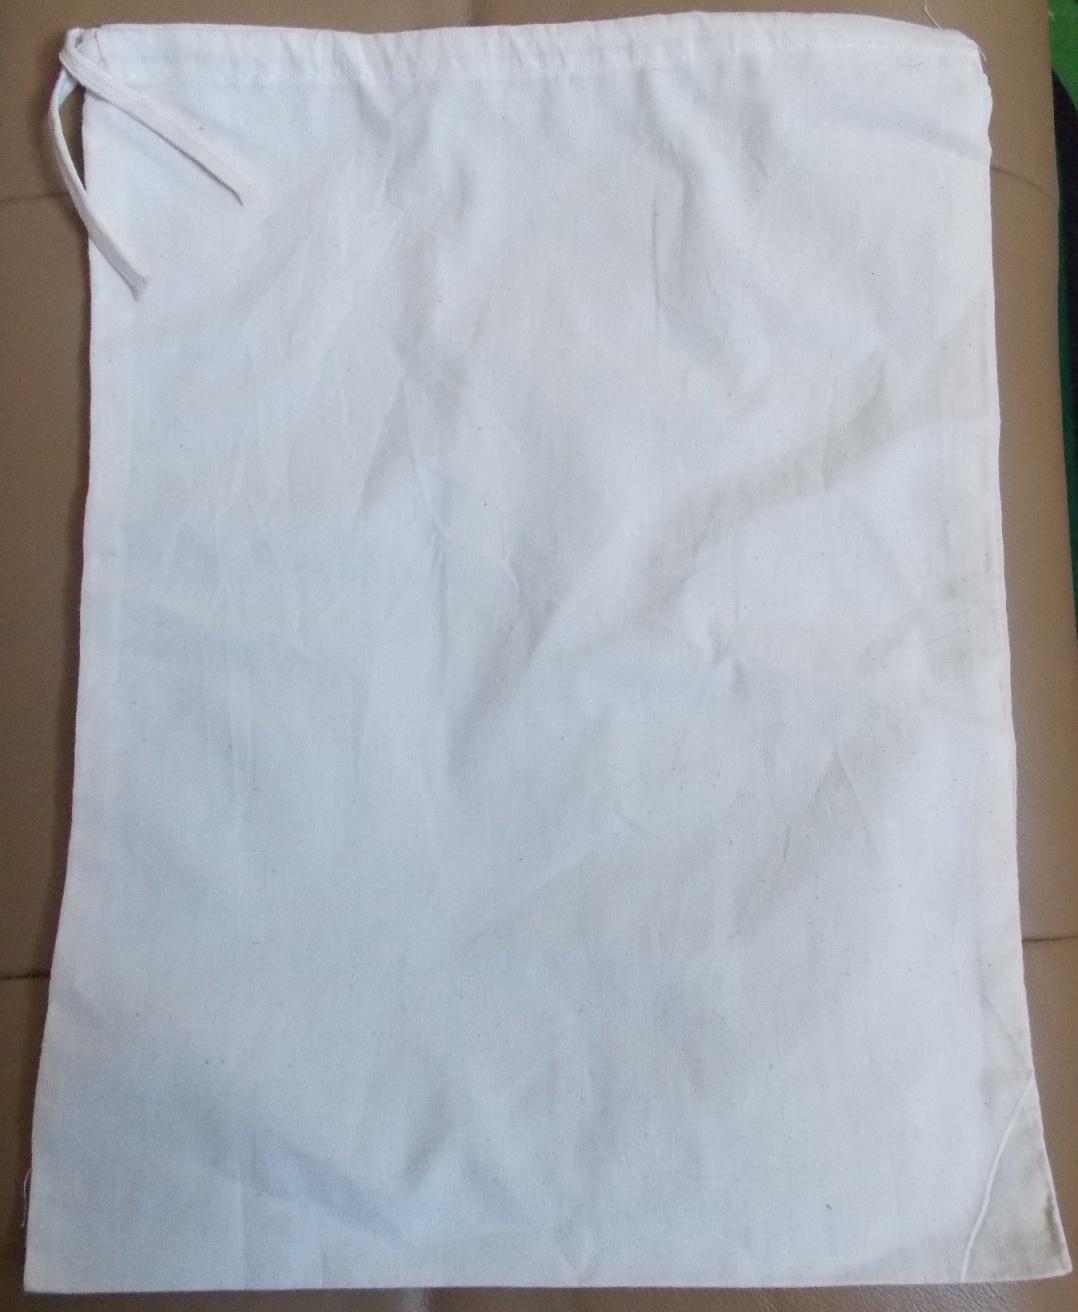 100% Cotton Muslin Drawstring Bags Made in USA - Worldwide ...